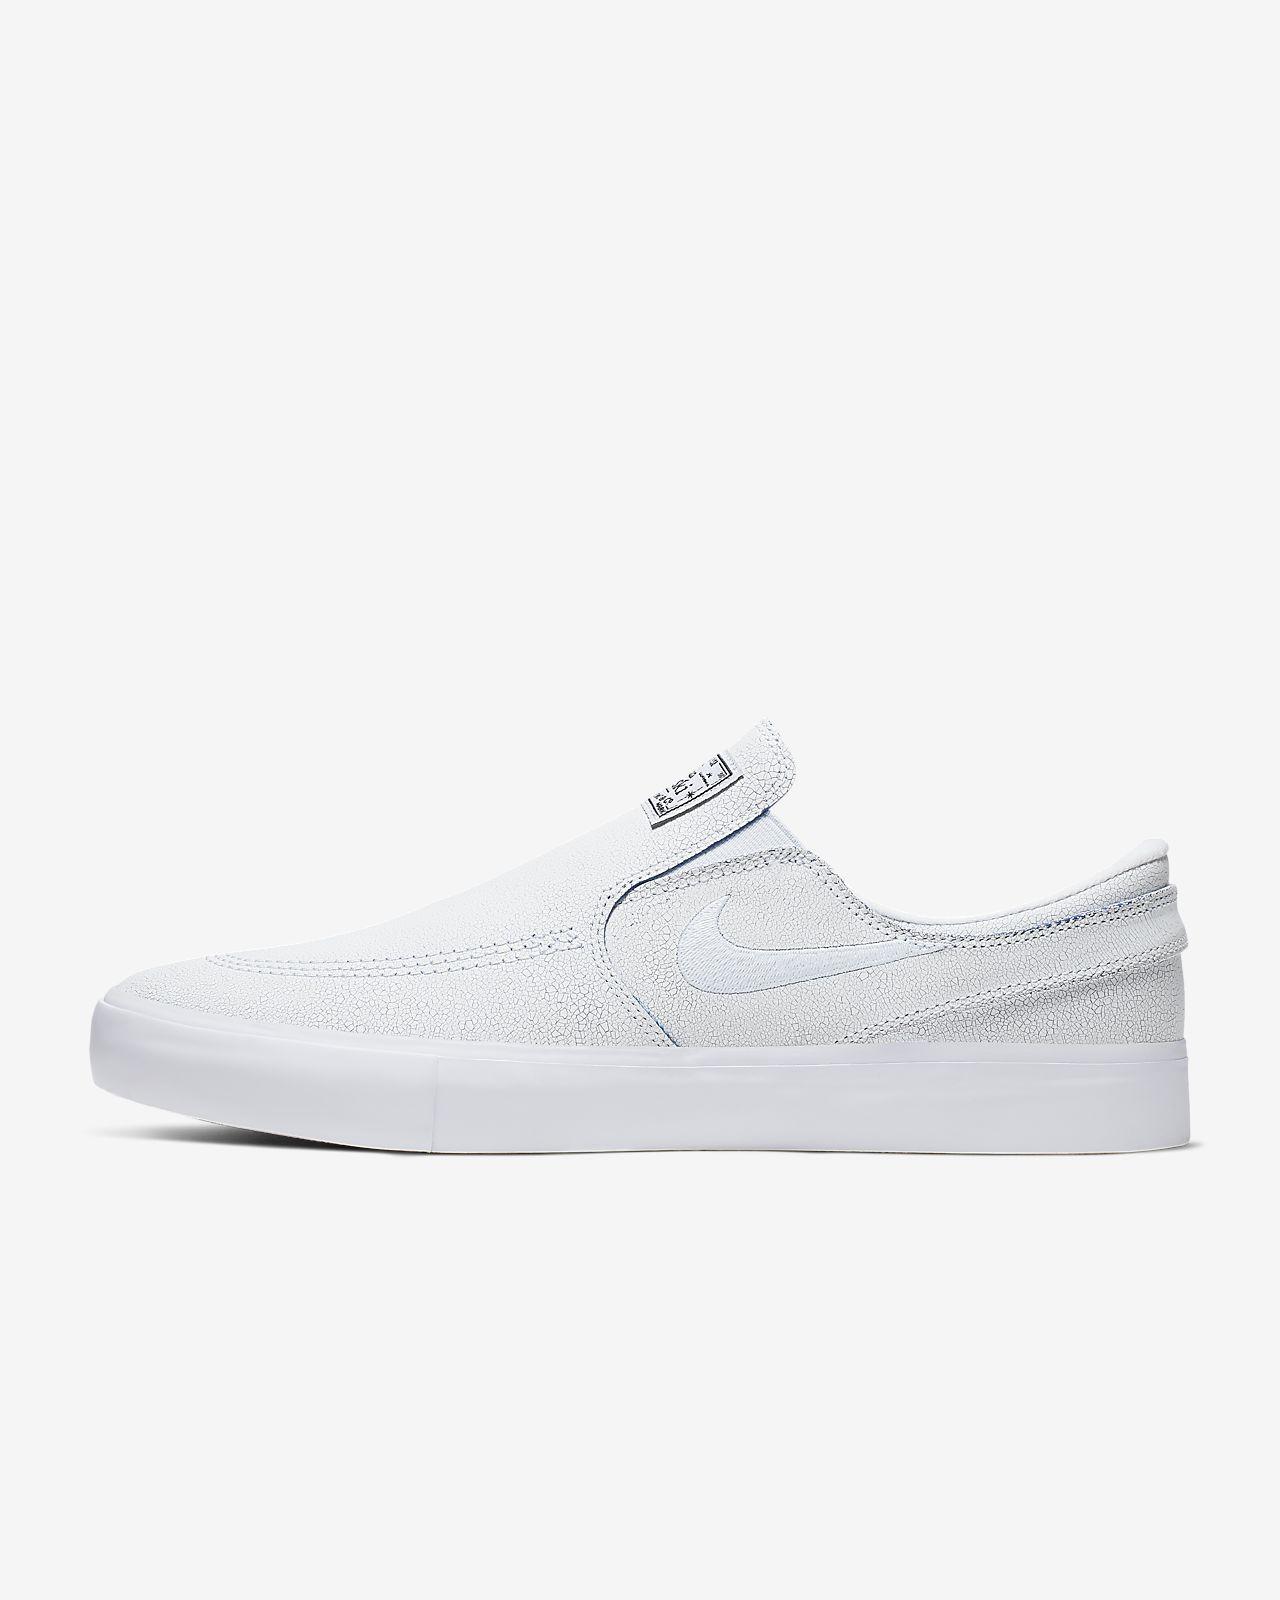 Nike SB Zoom Janoski Slip RM | Groen | Skateschoenen